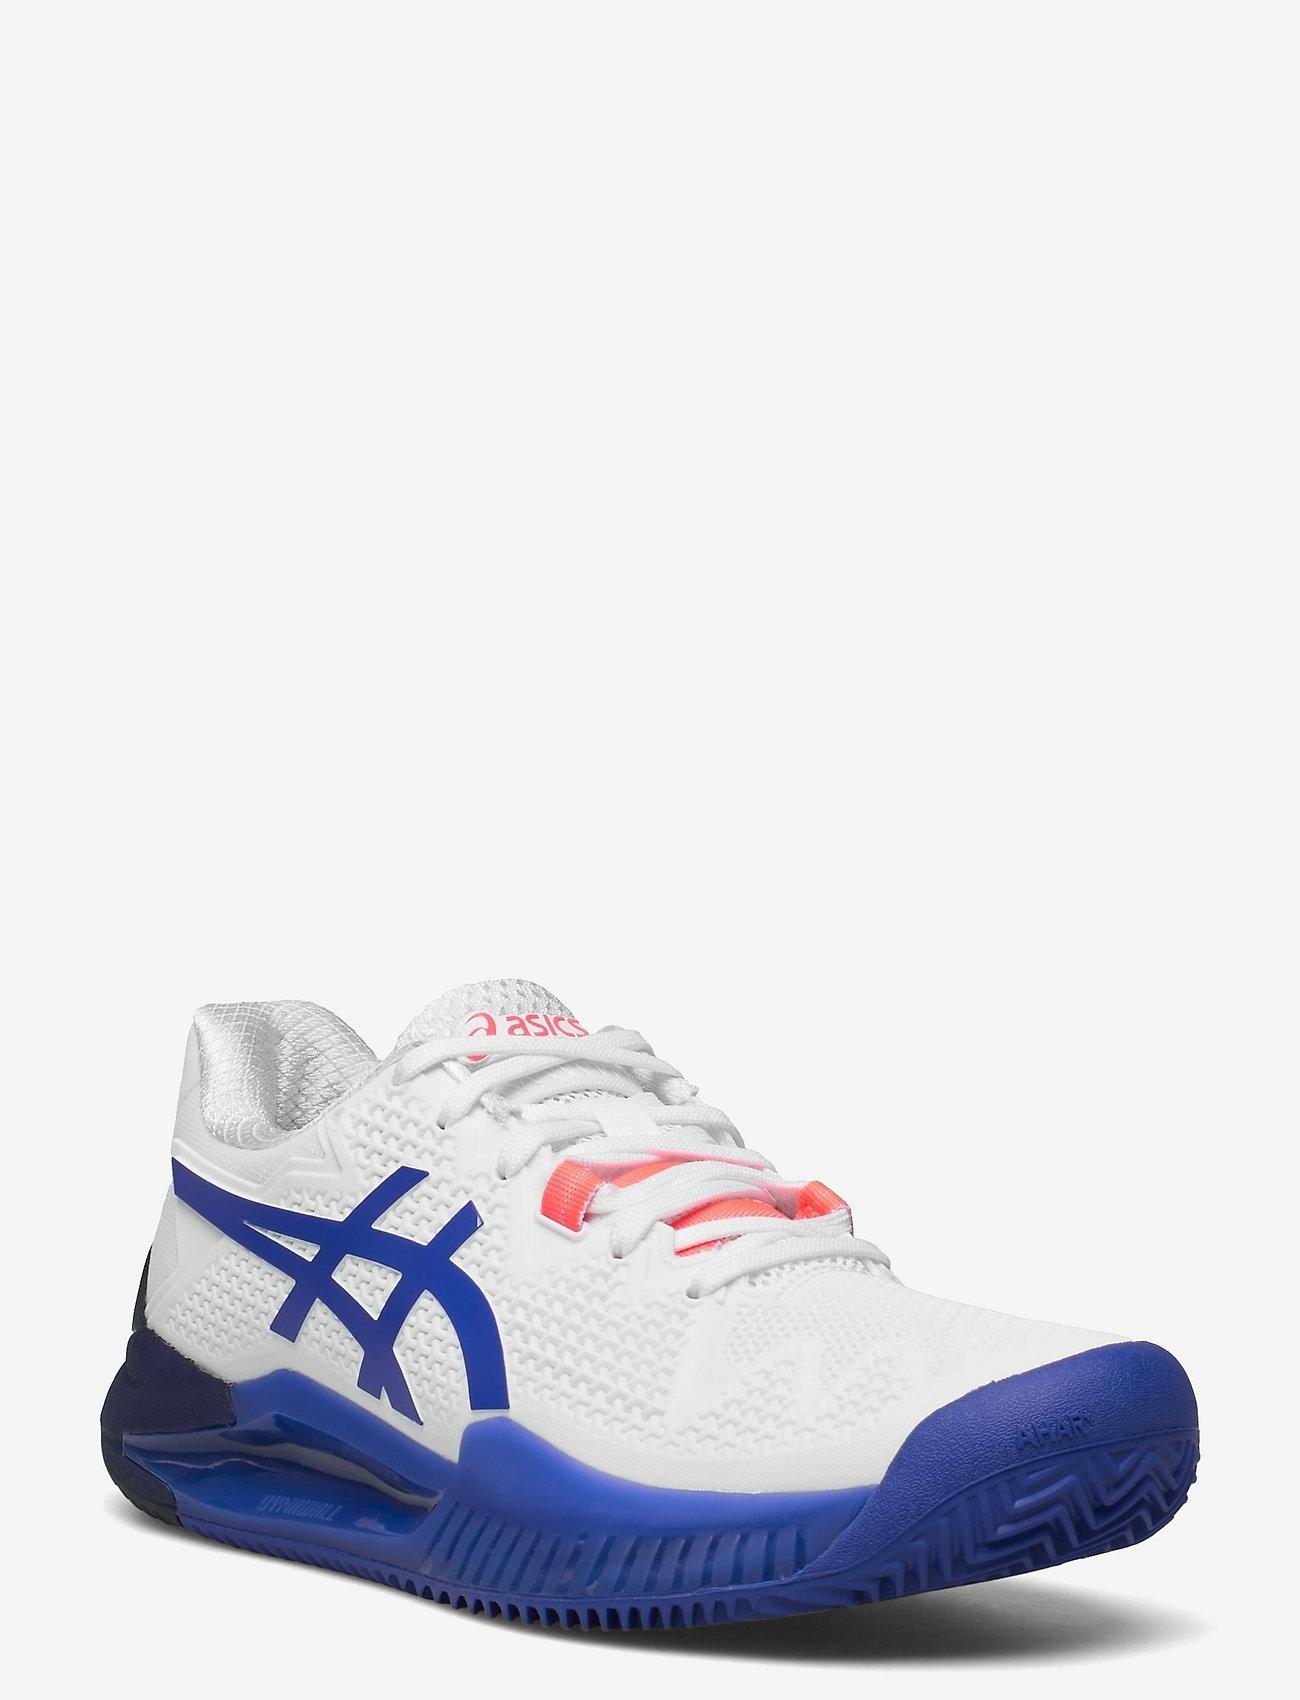 Asics - GEL-RESOLUTION 8 CLAY - ketsjersportsko - white/lapis lazuli blue - 0